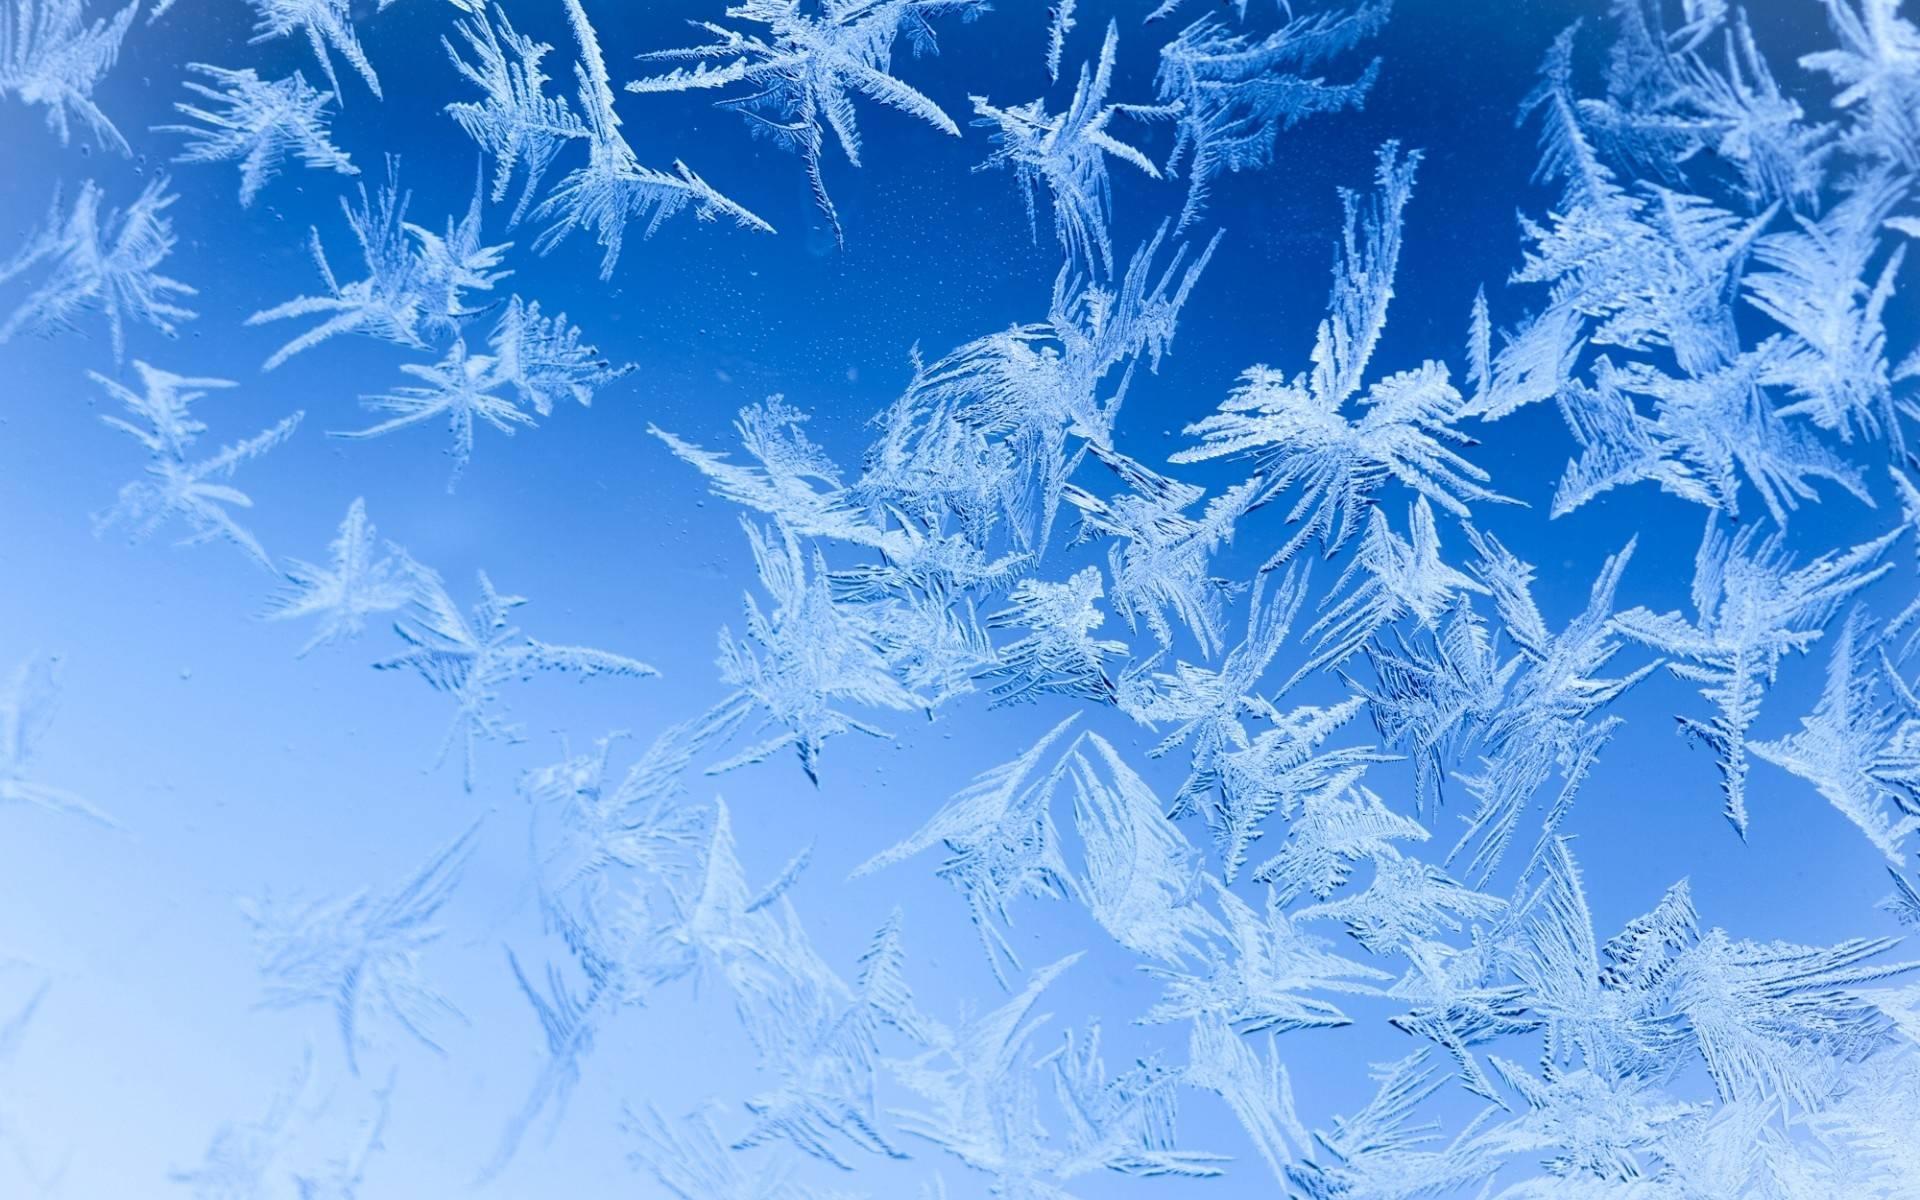 обои поверхность, узор, мороз, лед картинки фото